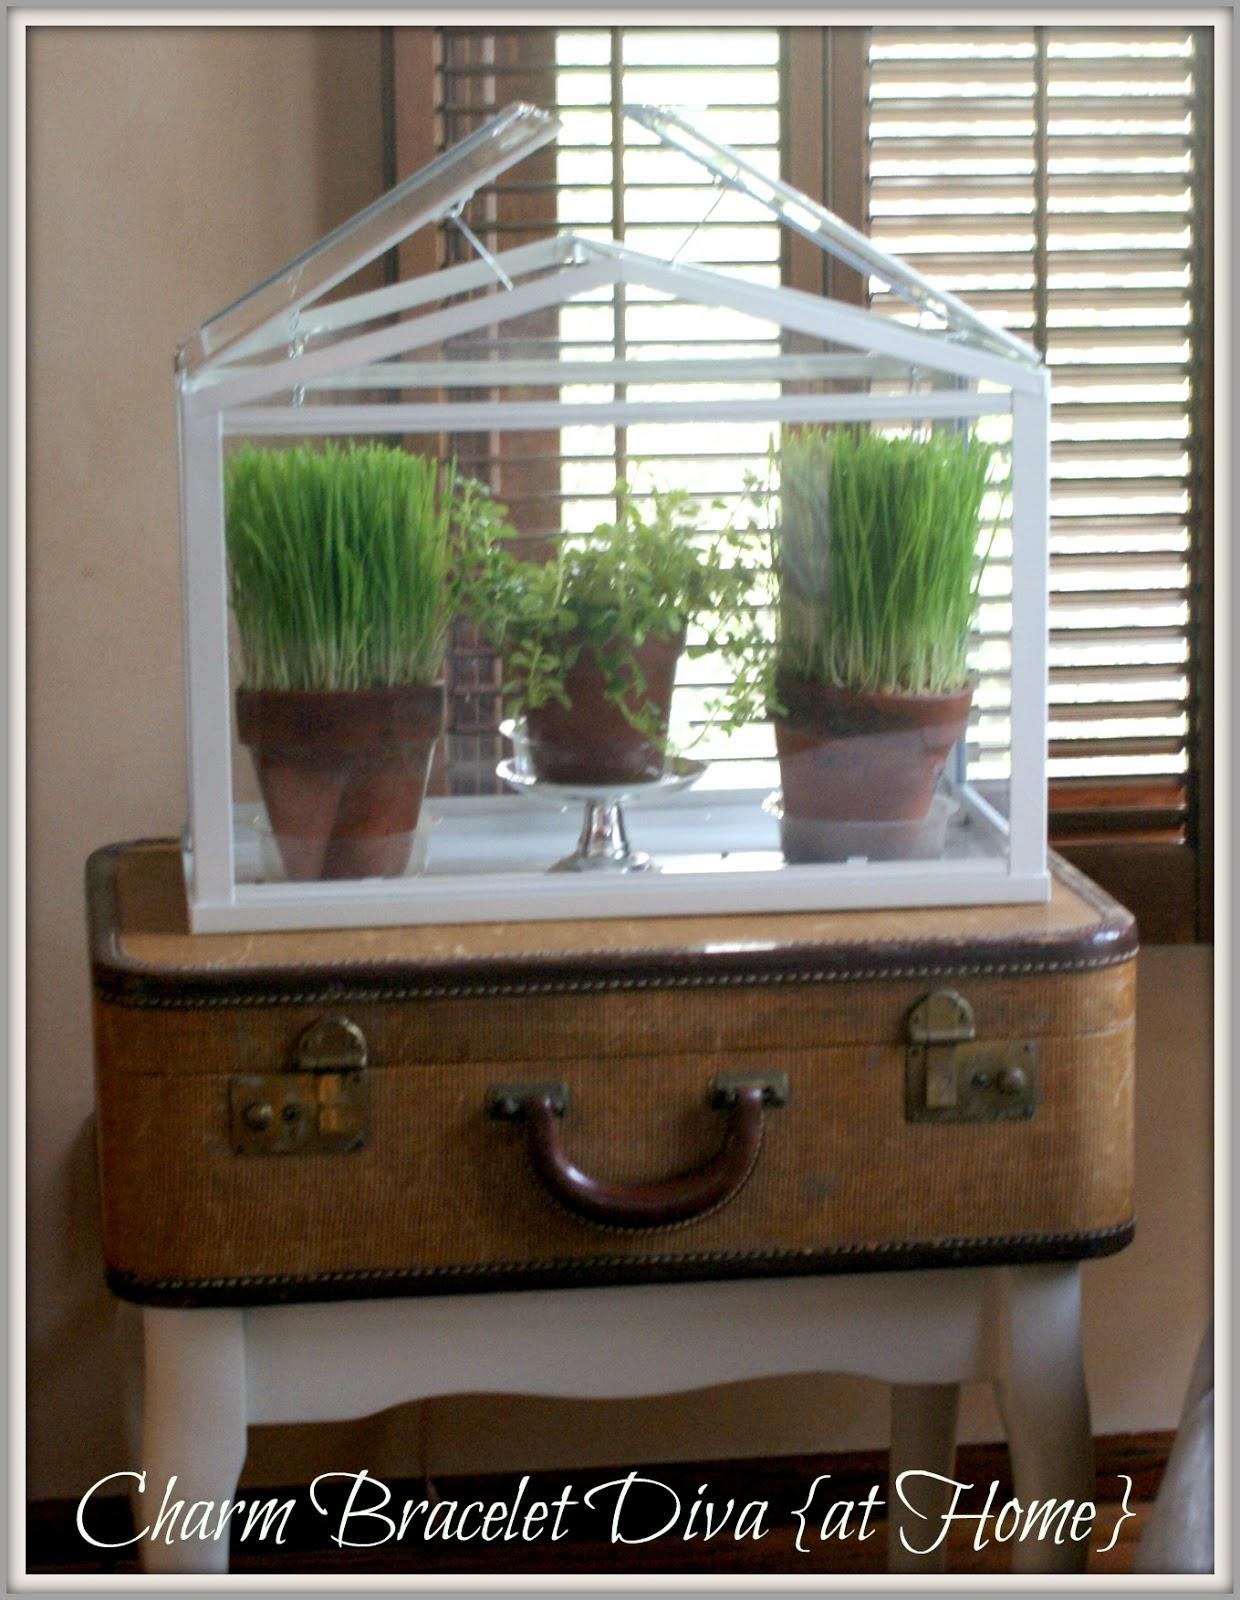 Our hopeful home wheat grass decor 101 ornamental wheat grass in clay pots in ikea terrarium workwithnaturefo